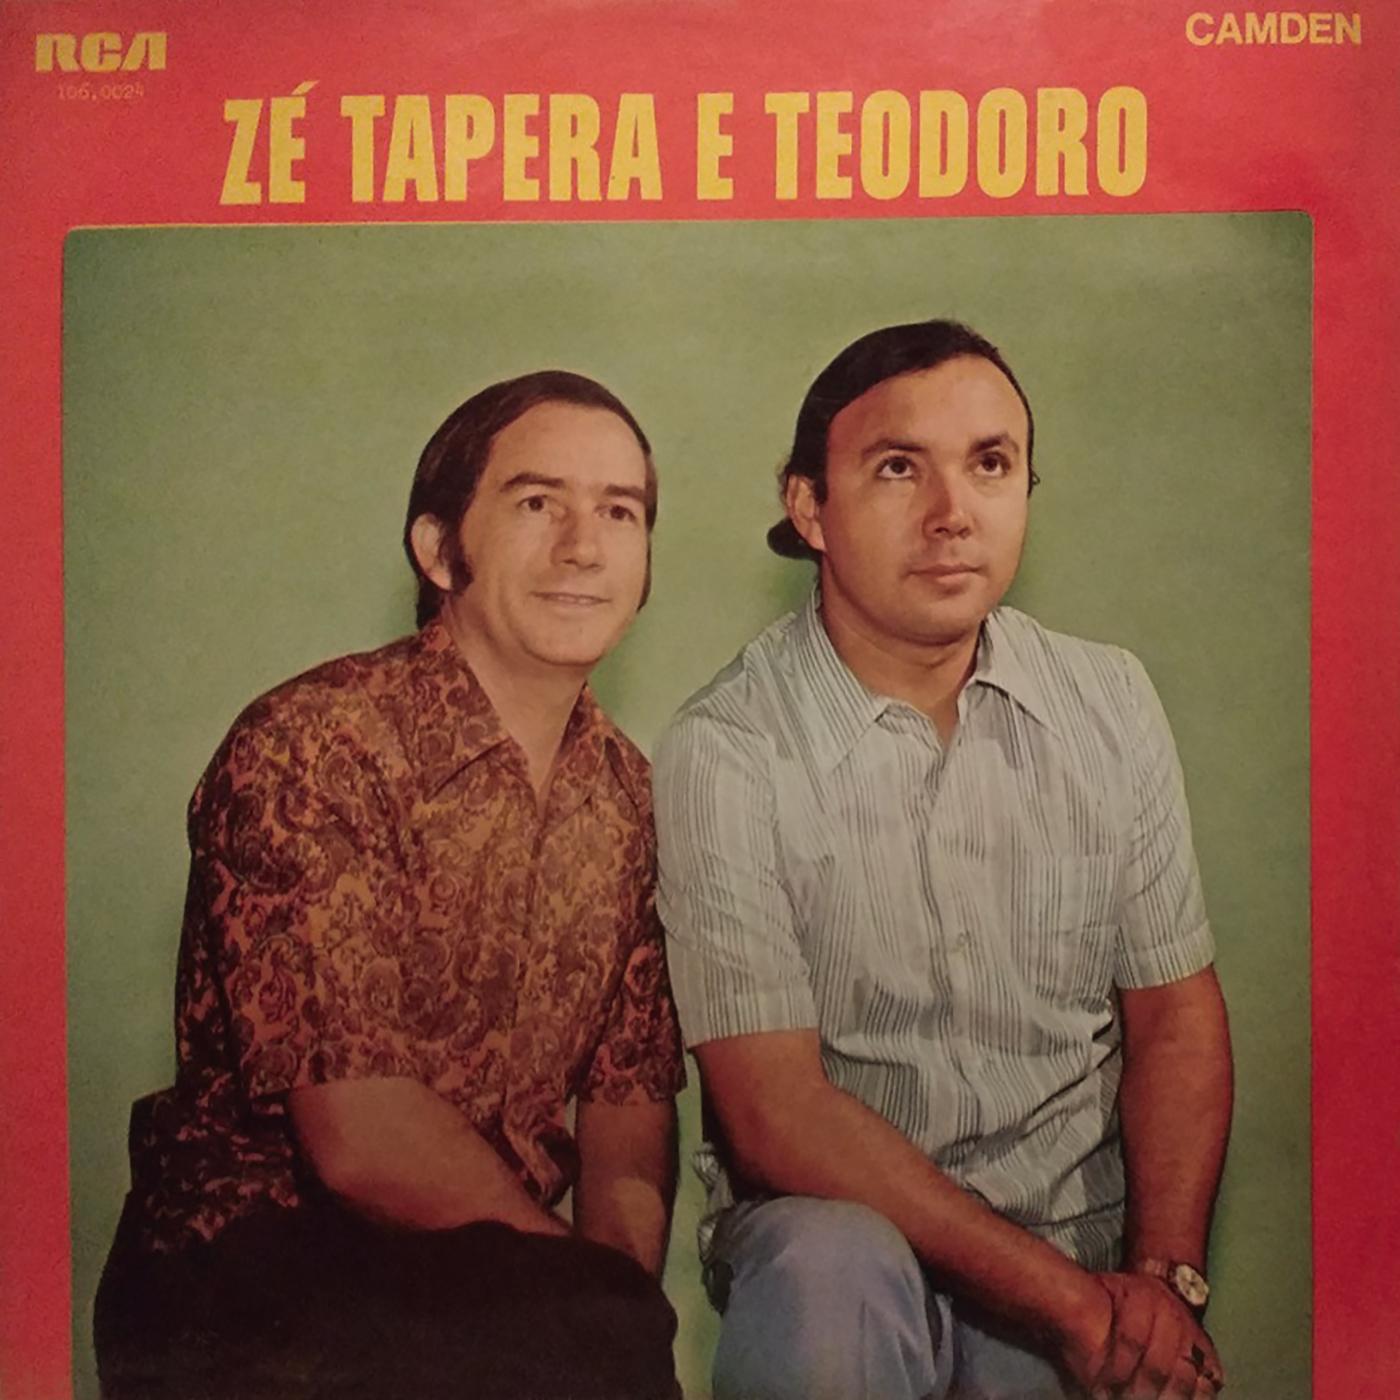 Zé Tapera e Teodoro - Zé Tapera & Teodoro